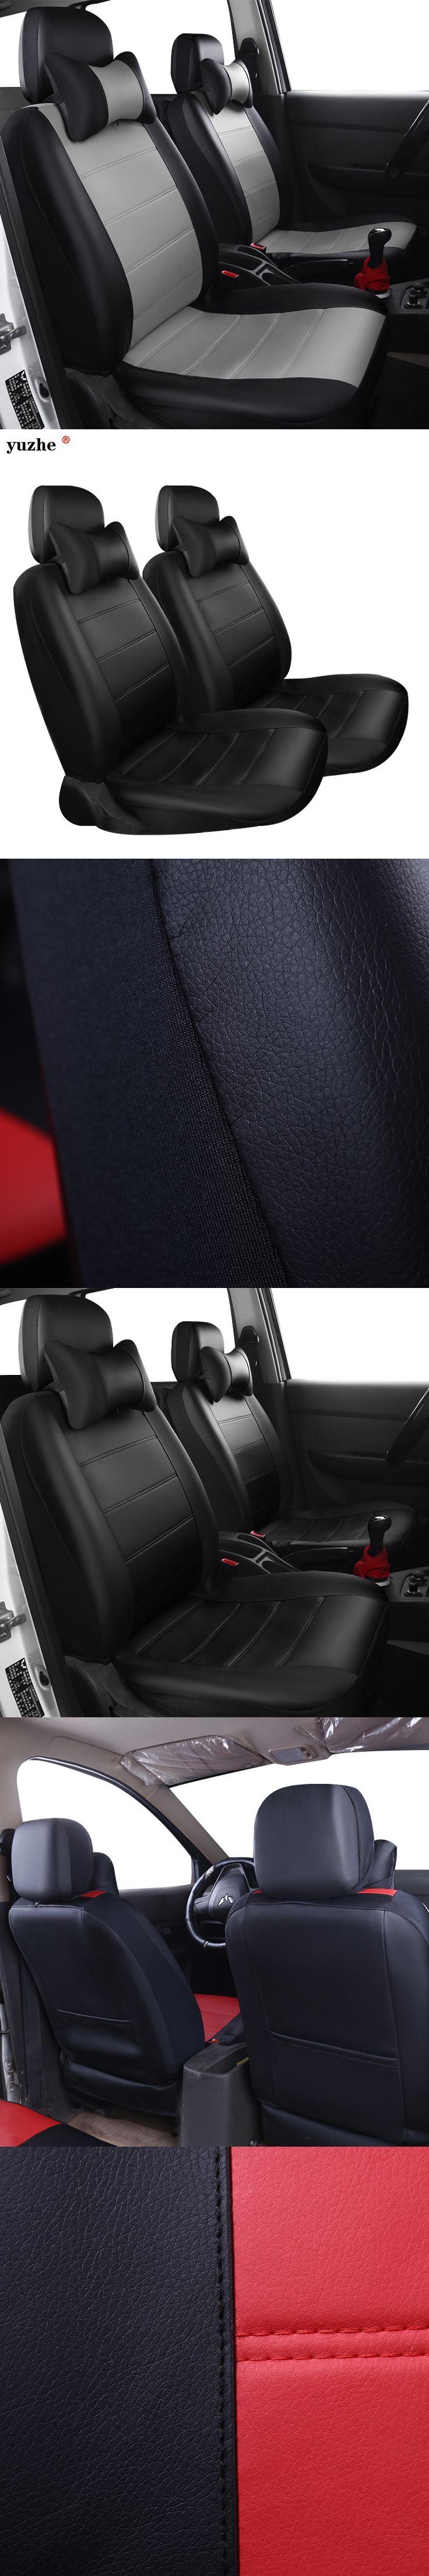 Yuzhe PU Leather Auto Universal Car Seat Covers Automotive Seat Covers for toyota lada kalina granta priora renault logan